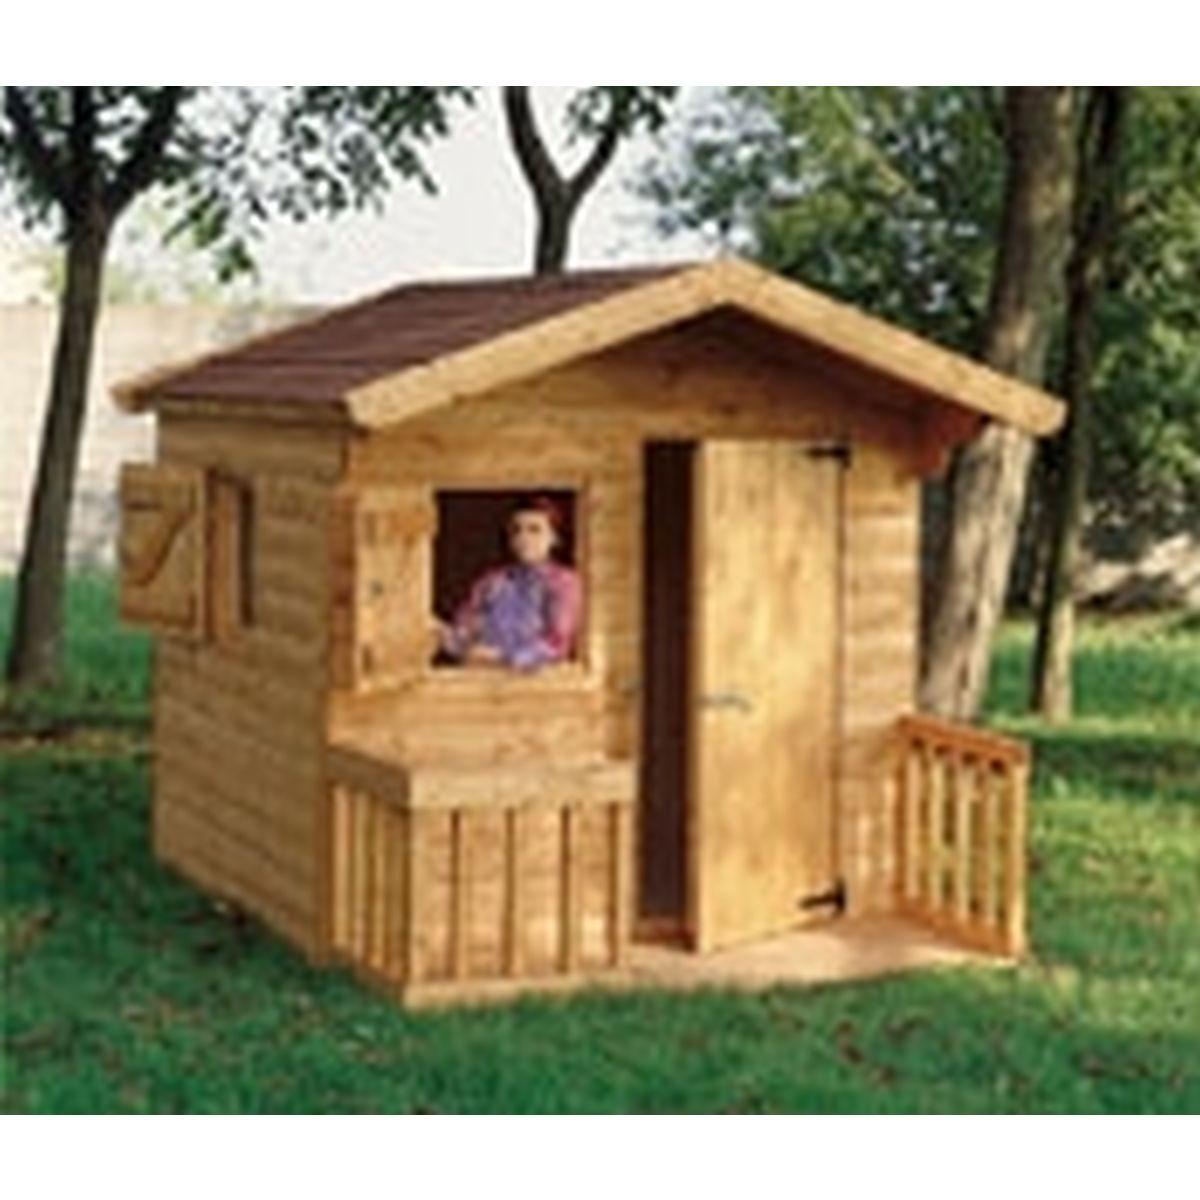 Casetta in legno per bimbi4236 casetta da giardino in for Casetta da giardino per bambini usata